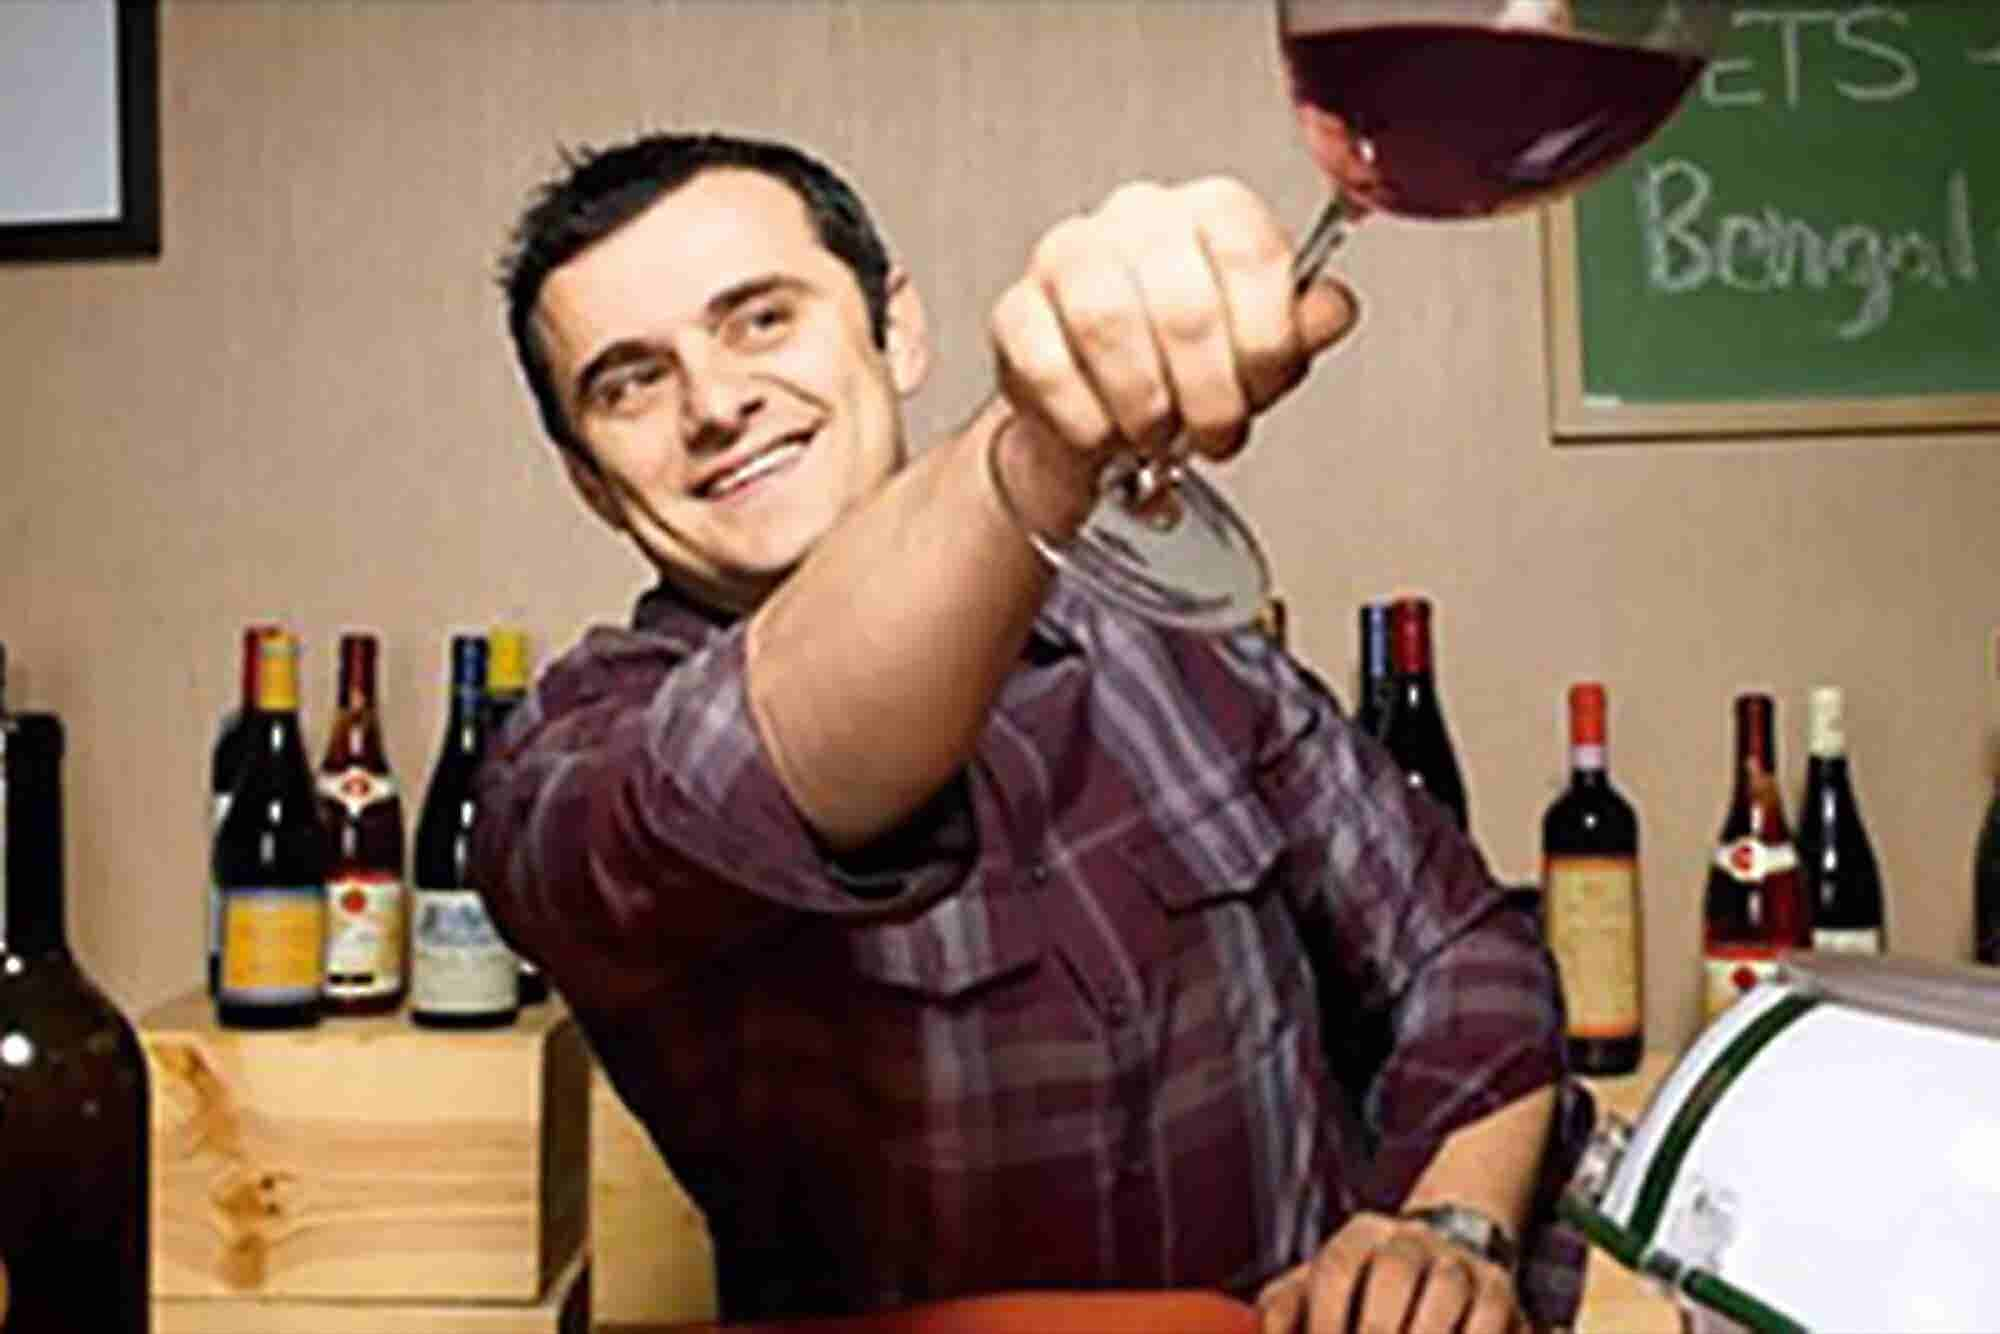 How Gary Vaynerchuk Went from 'America's Wine Guy' to Business Expert